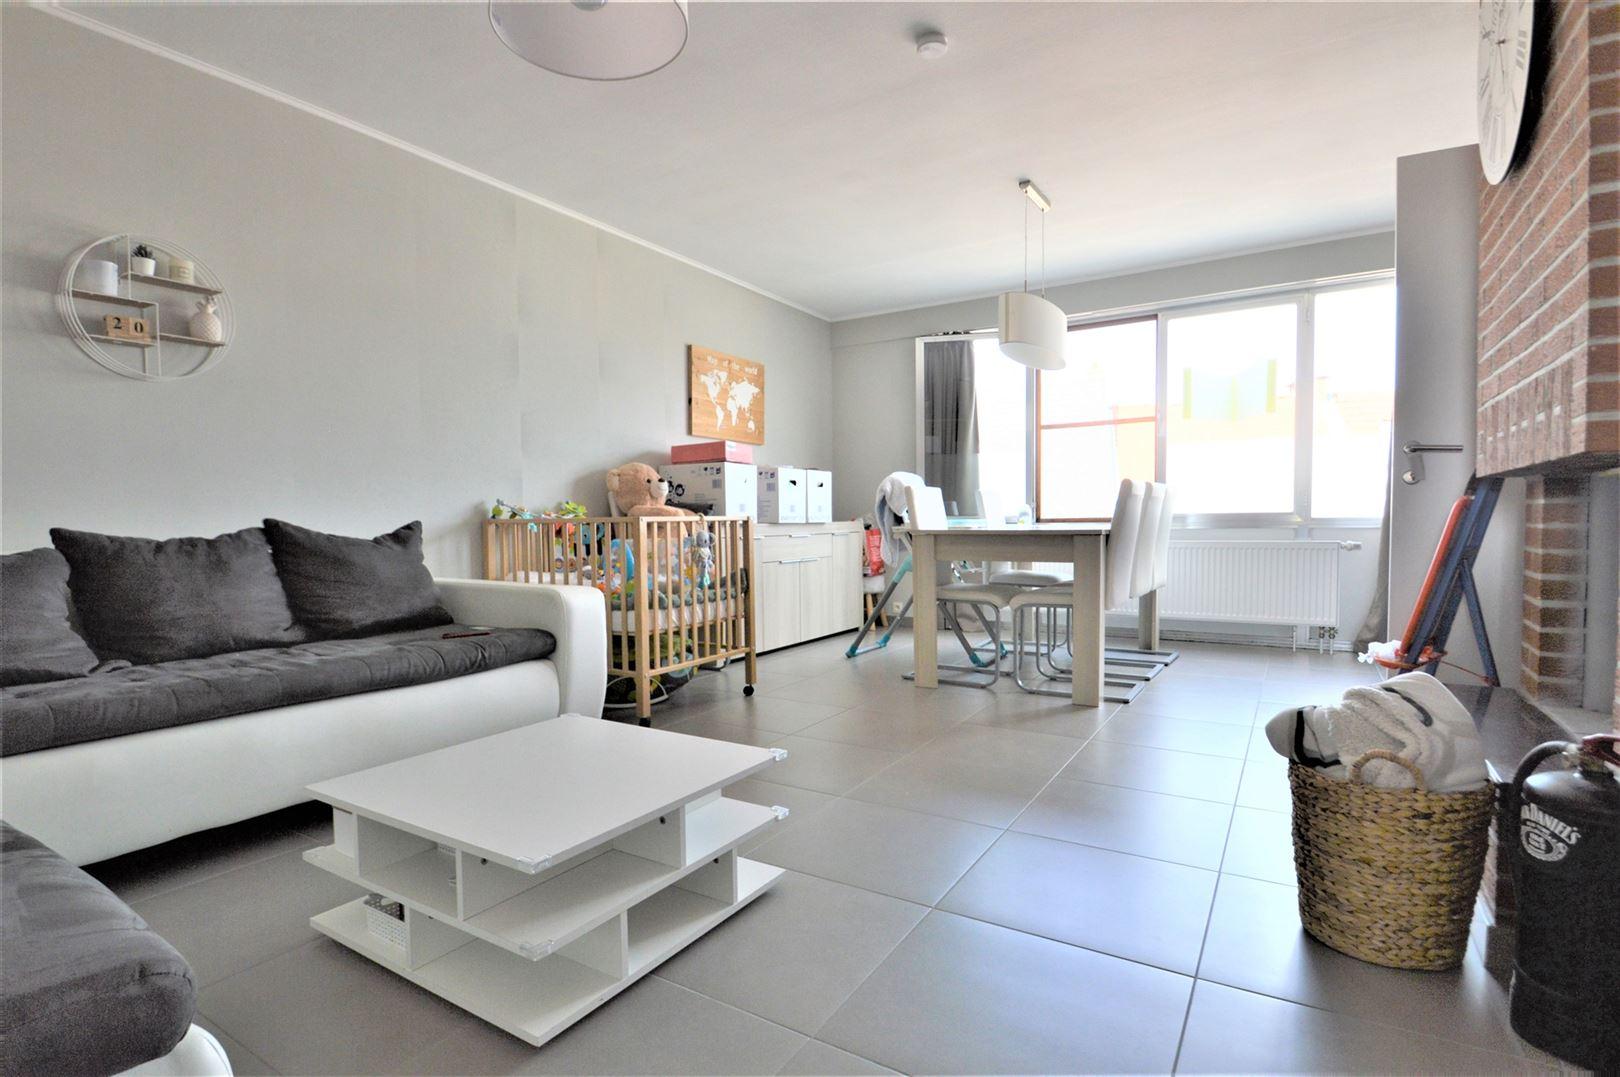 Foto 2 : Appartement te 9280 LEBBEKE (België) - Prijs € 635